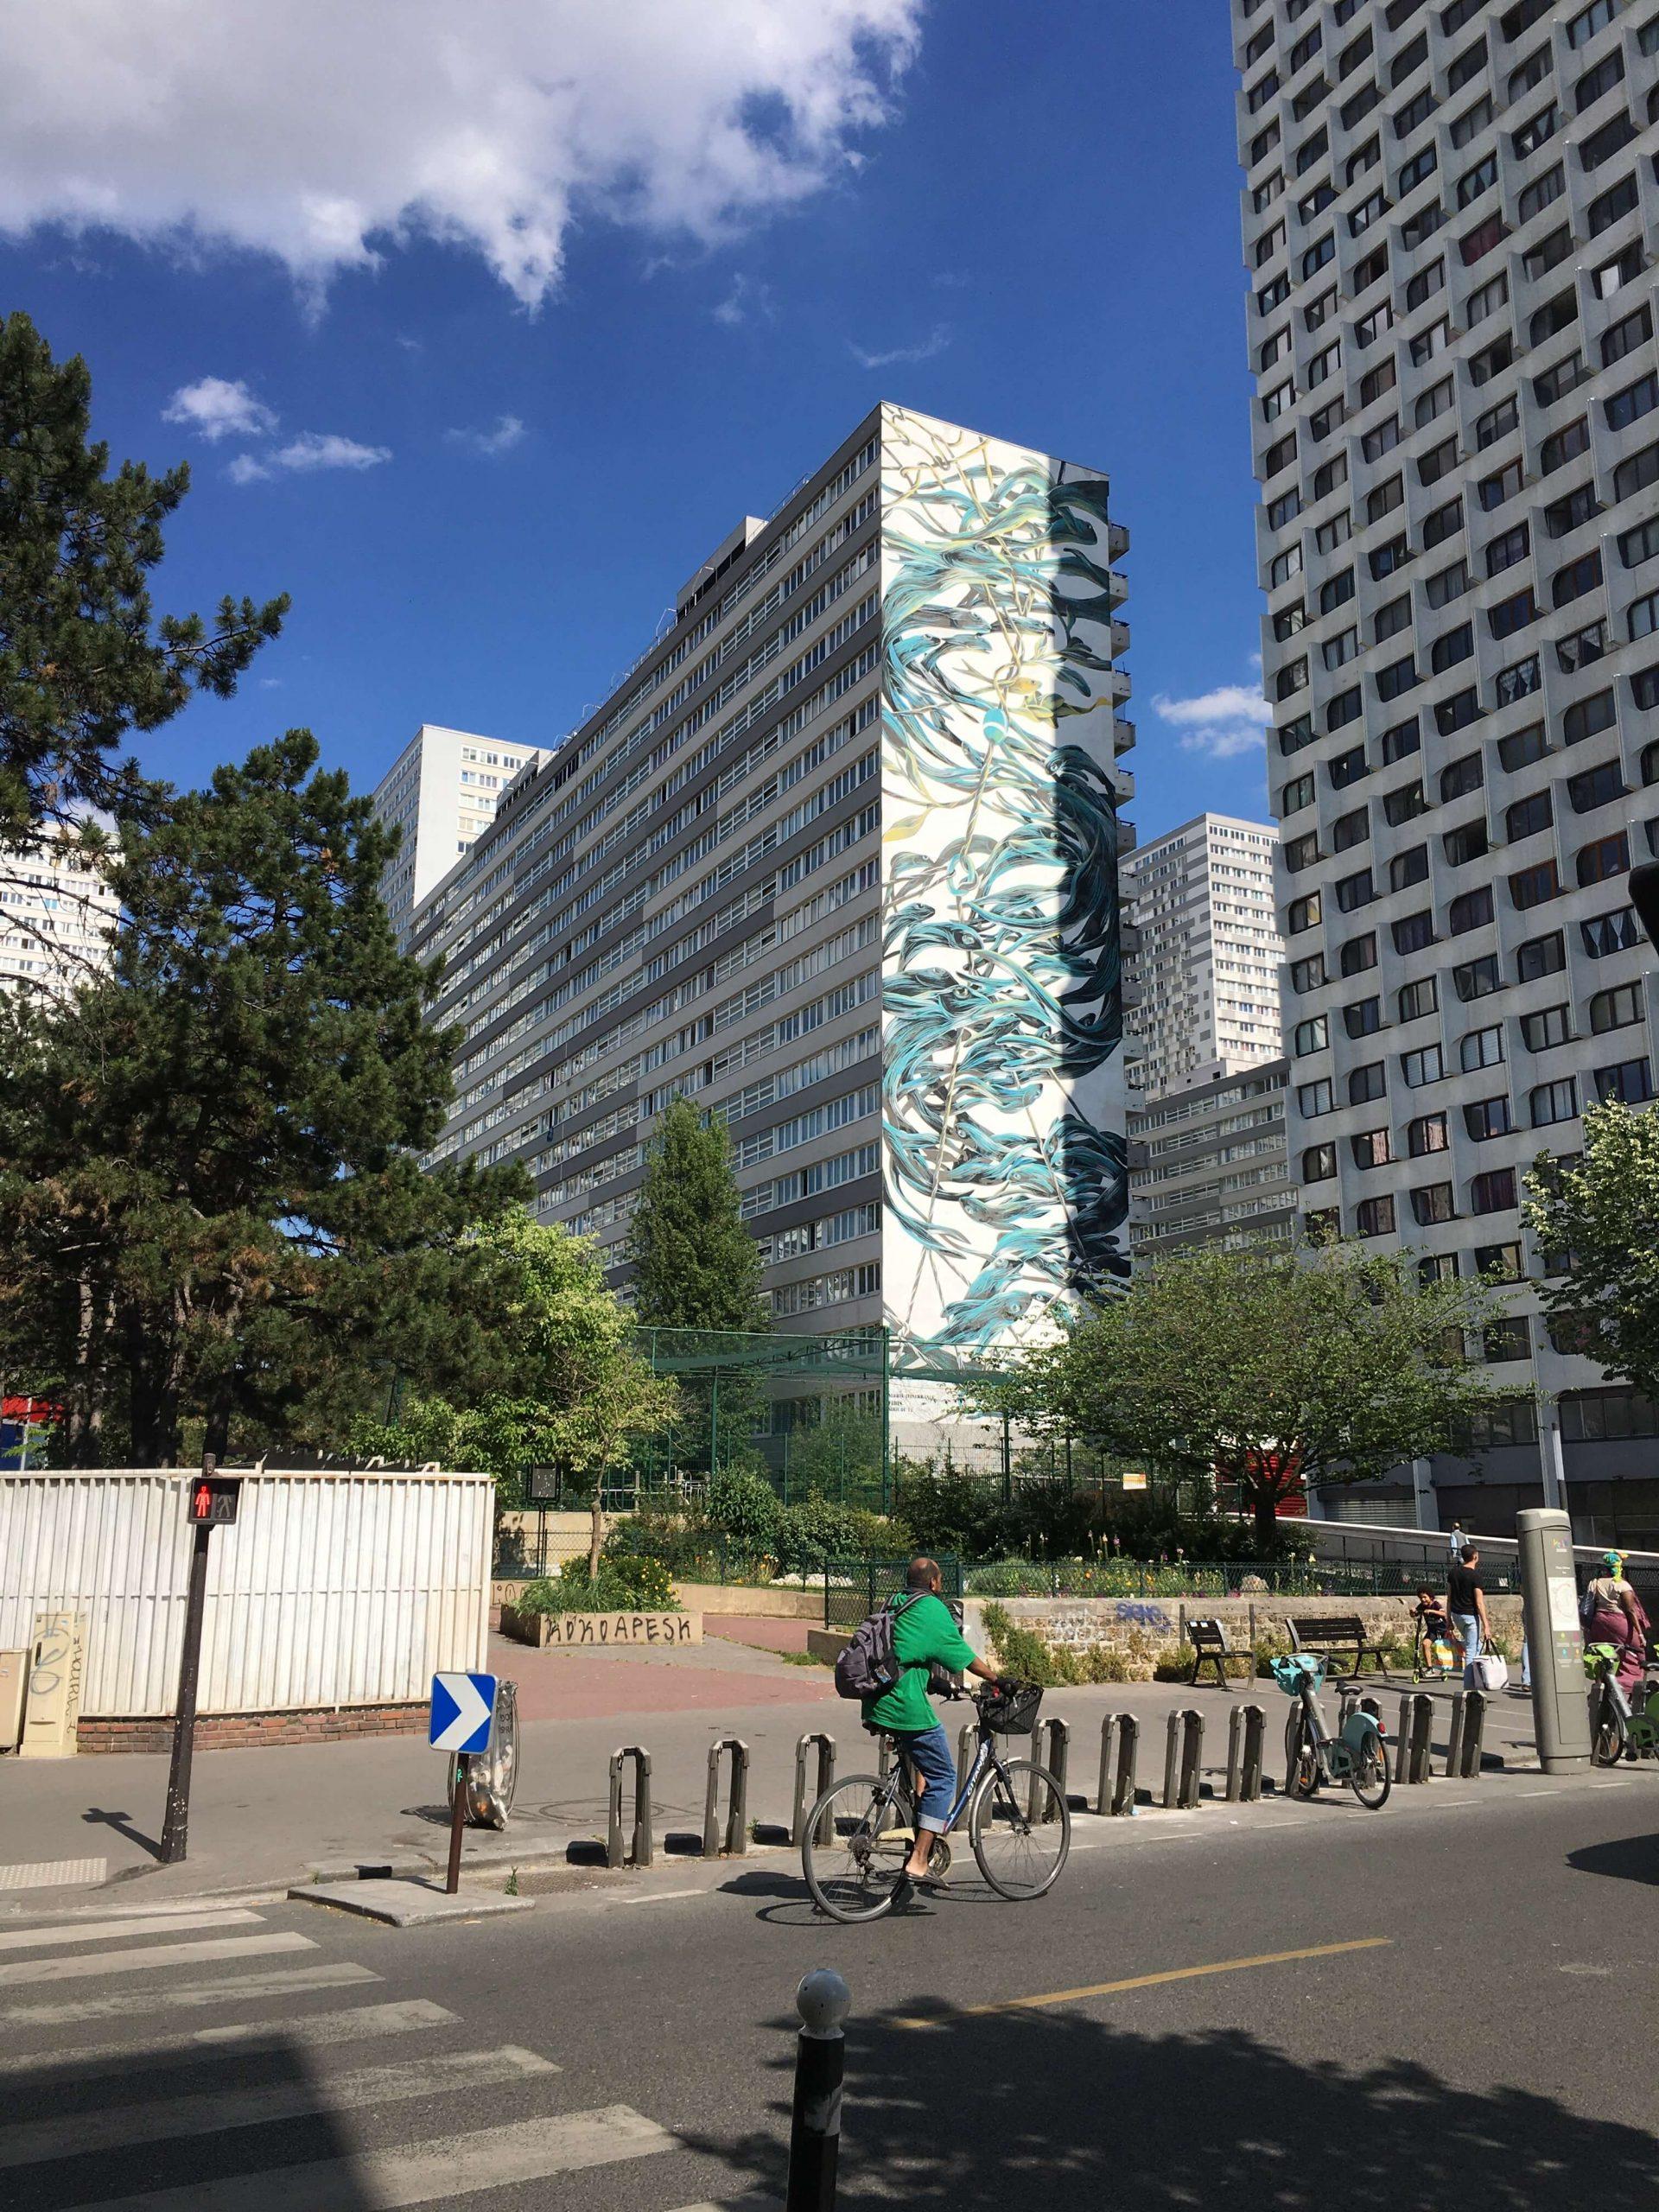 The Giant Murals in Paris